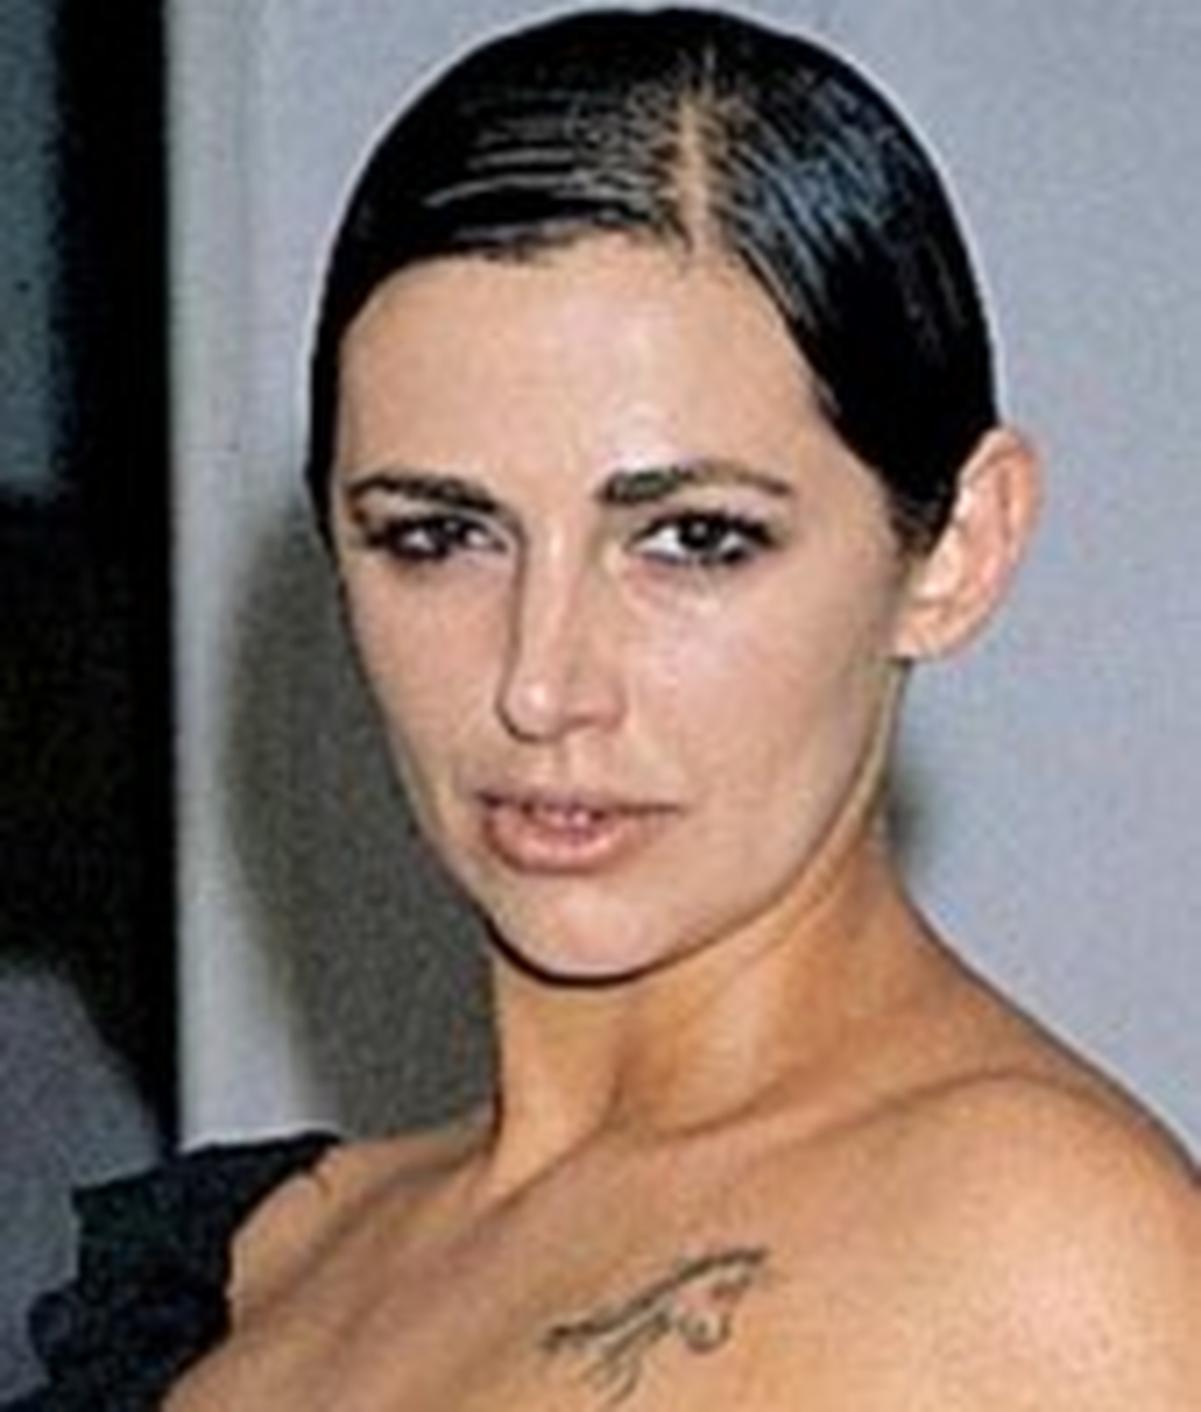 Monica Noriega